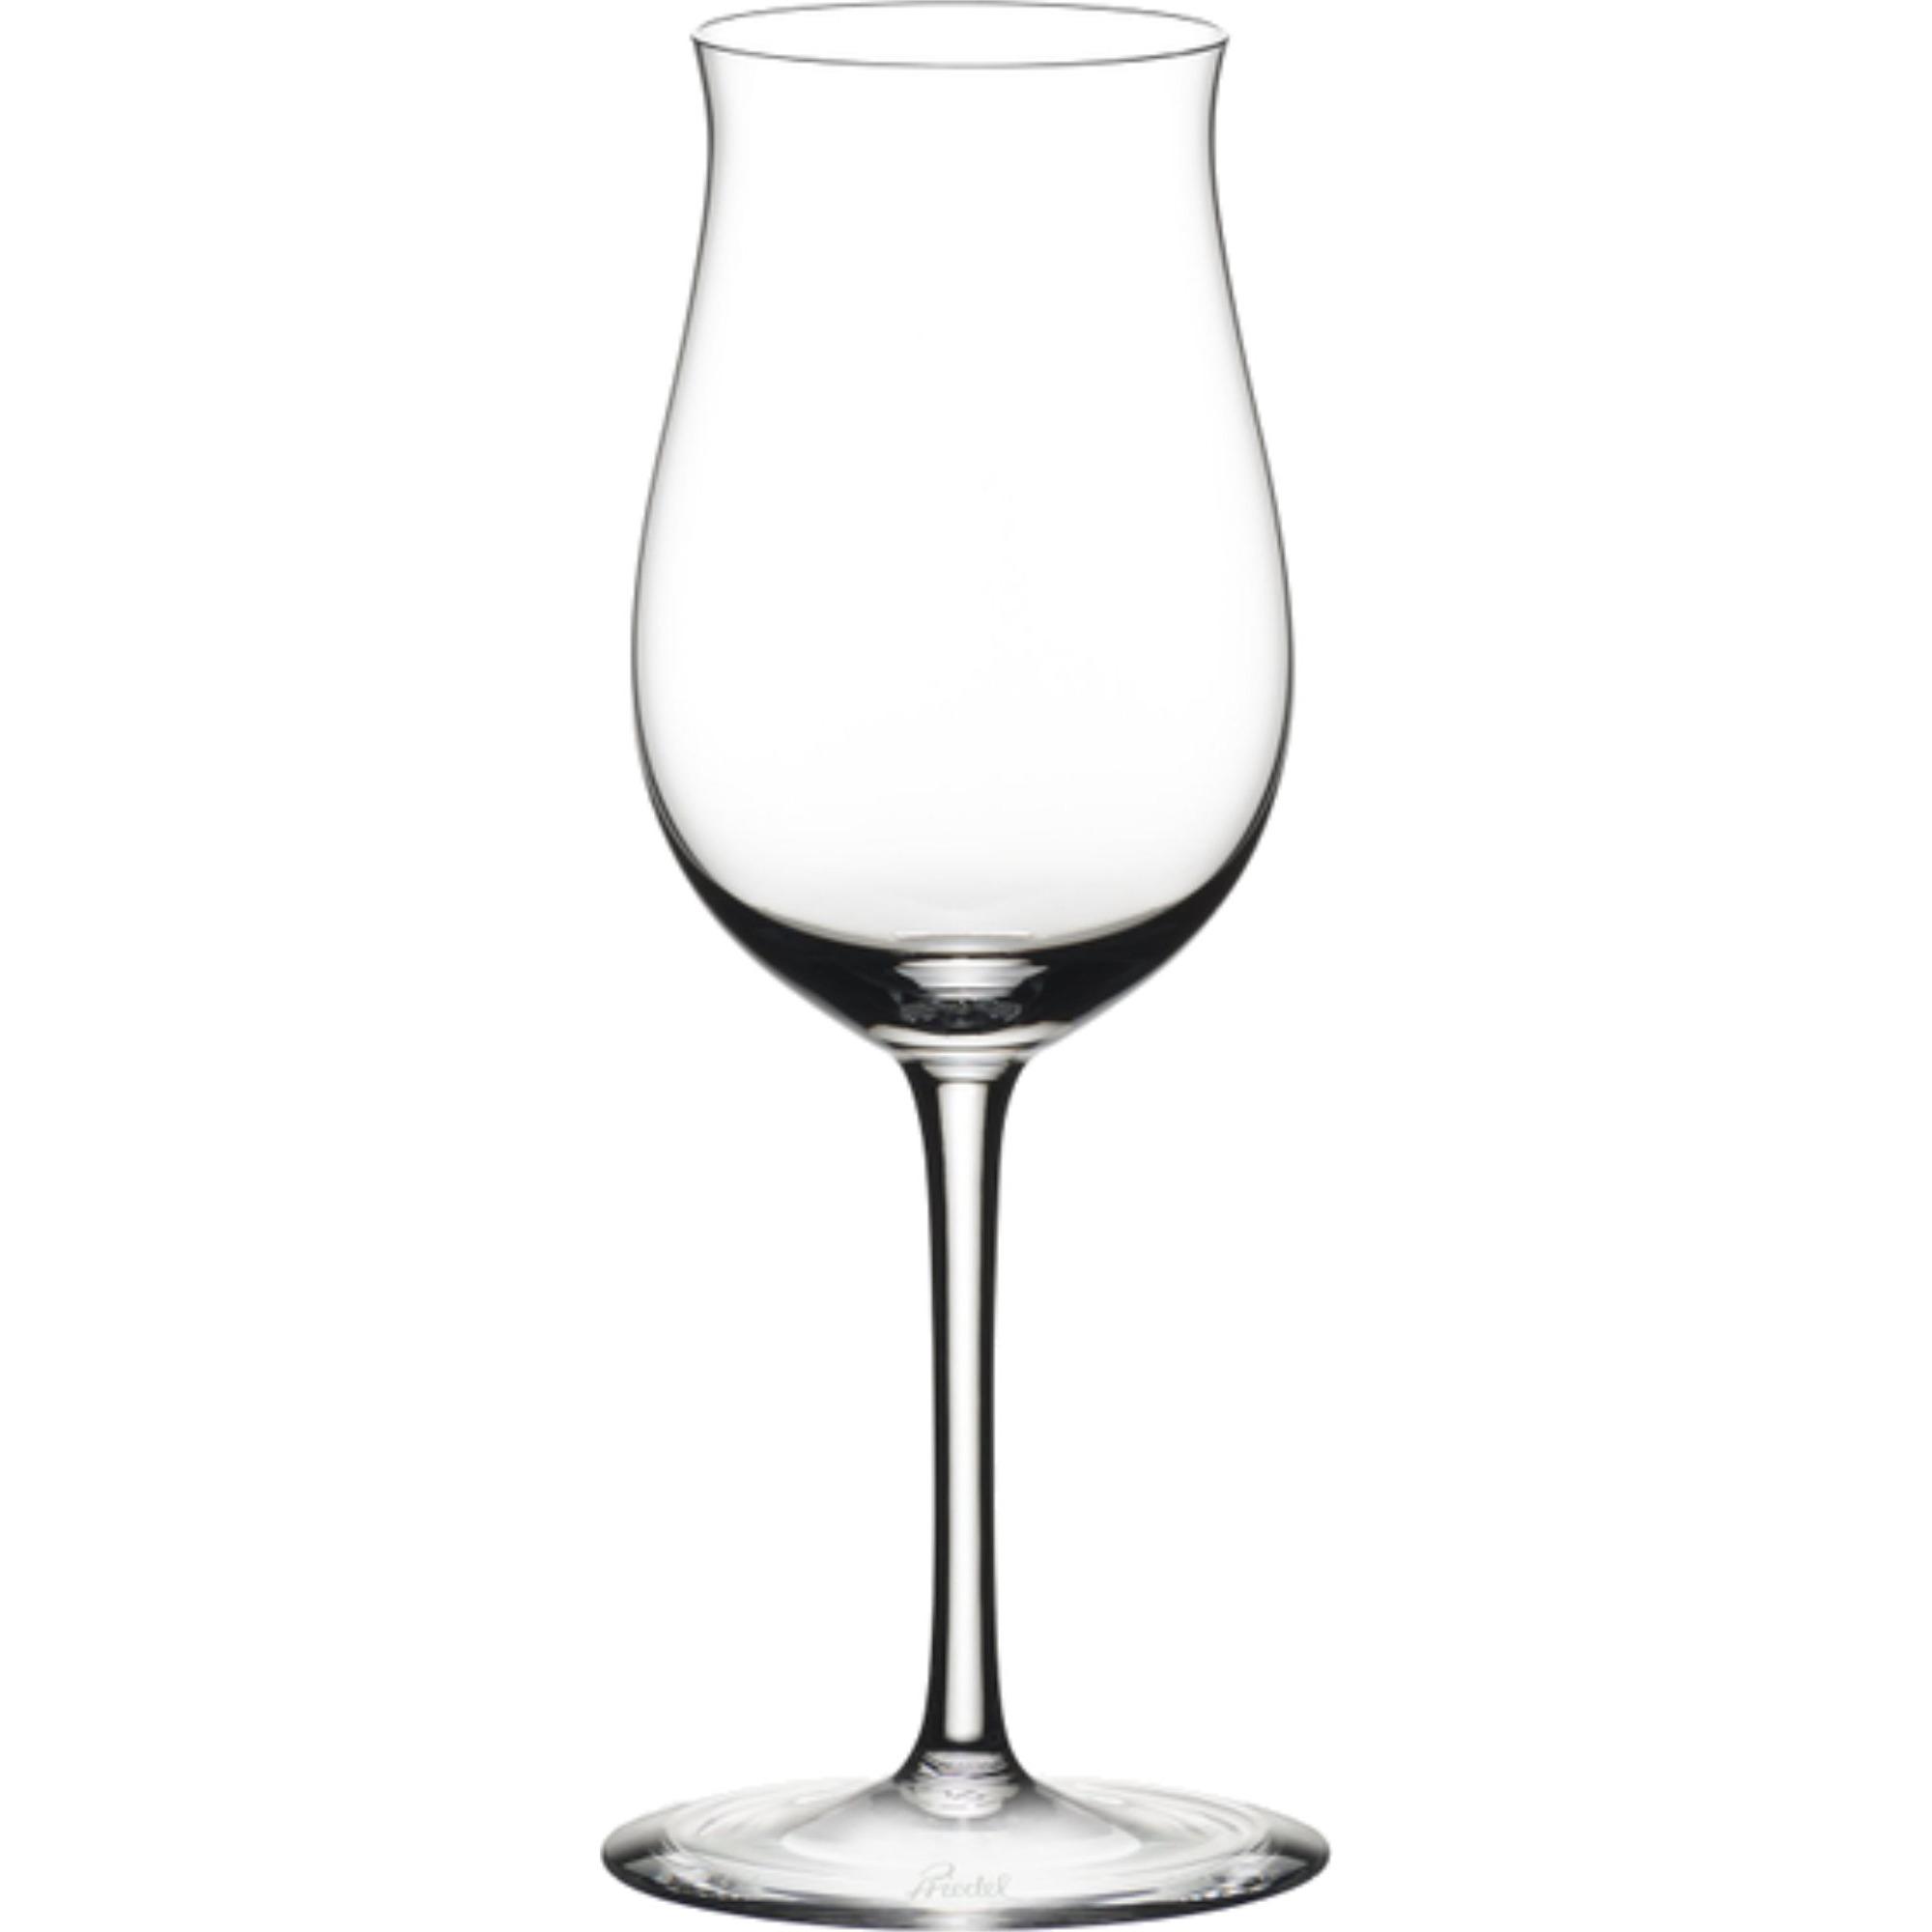 Riedel Sommelier V.S.O.P Cognacglas 16 cl